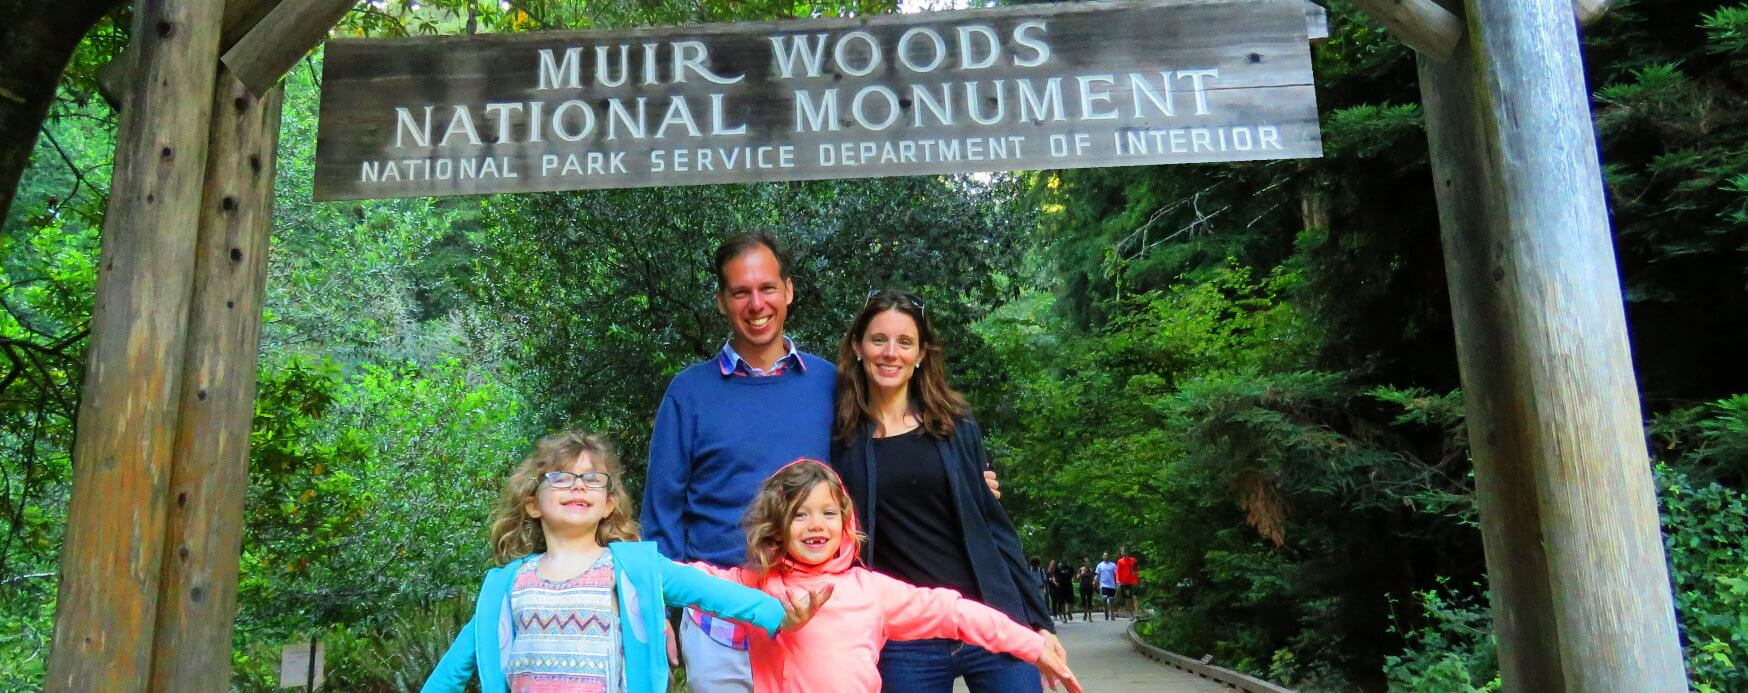 family-fun-things-to-do-muirwoods